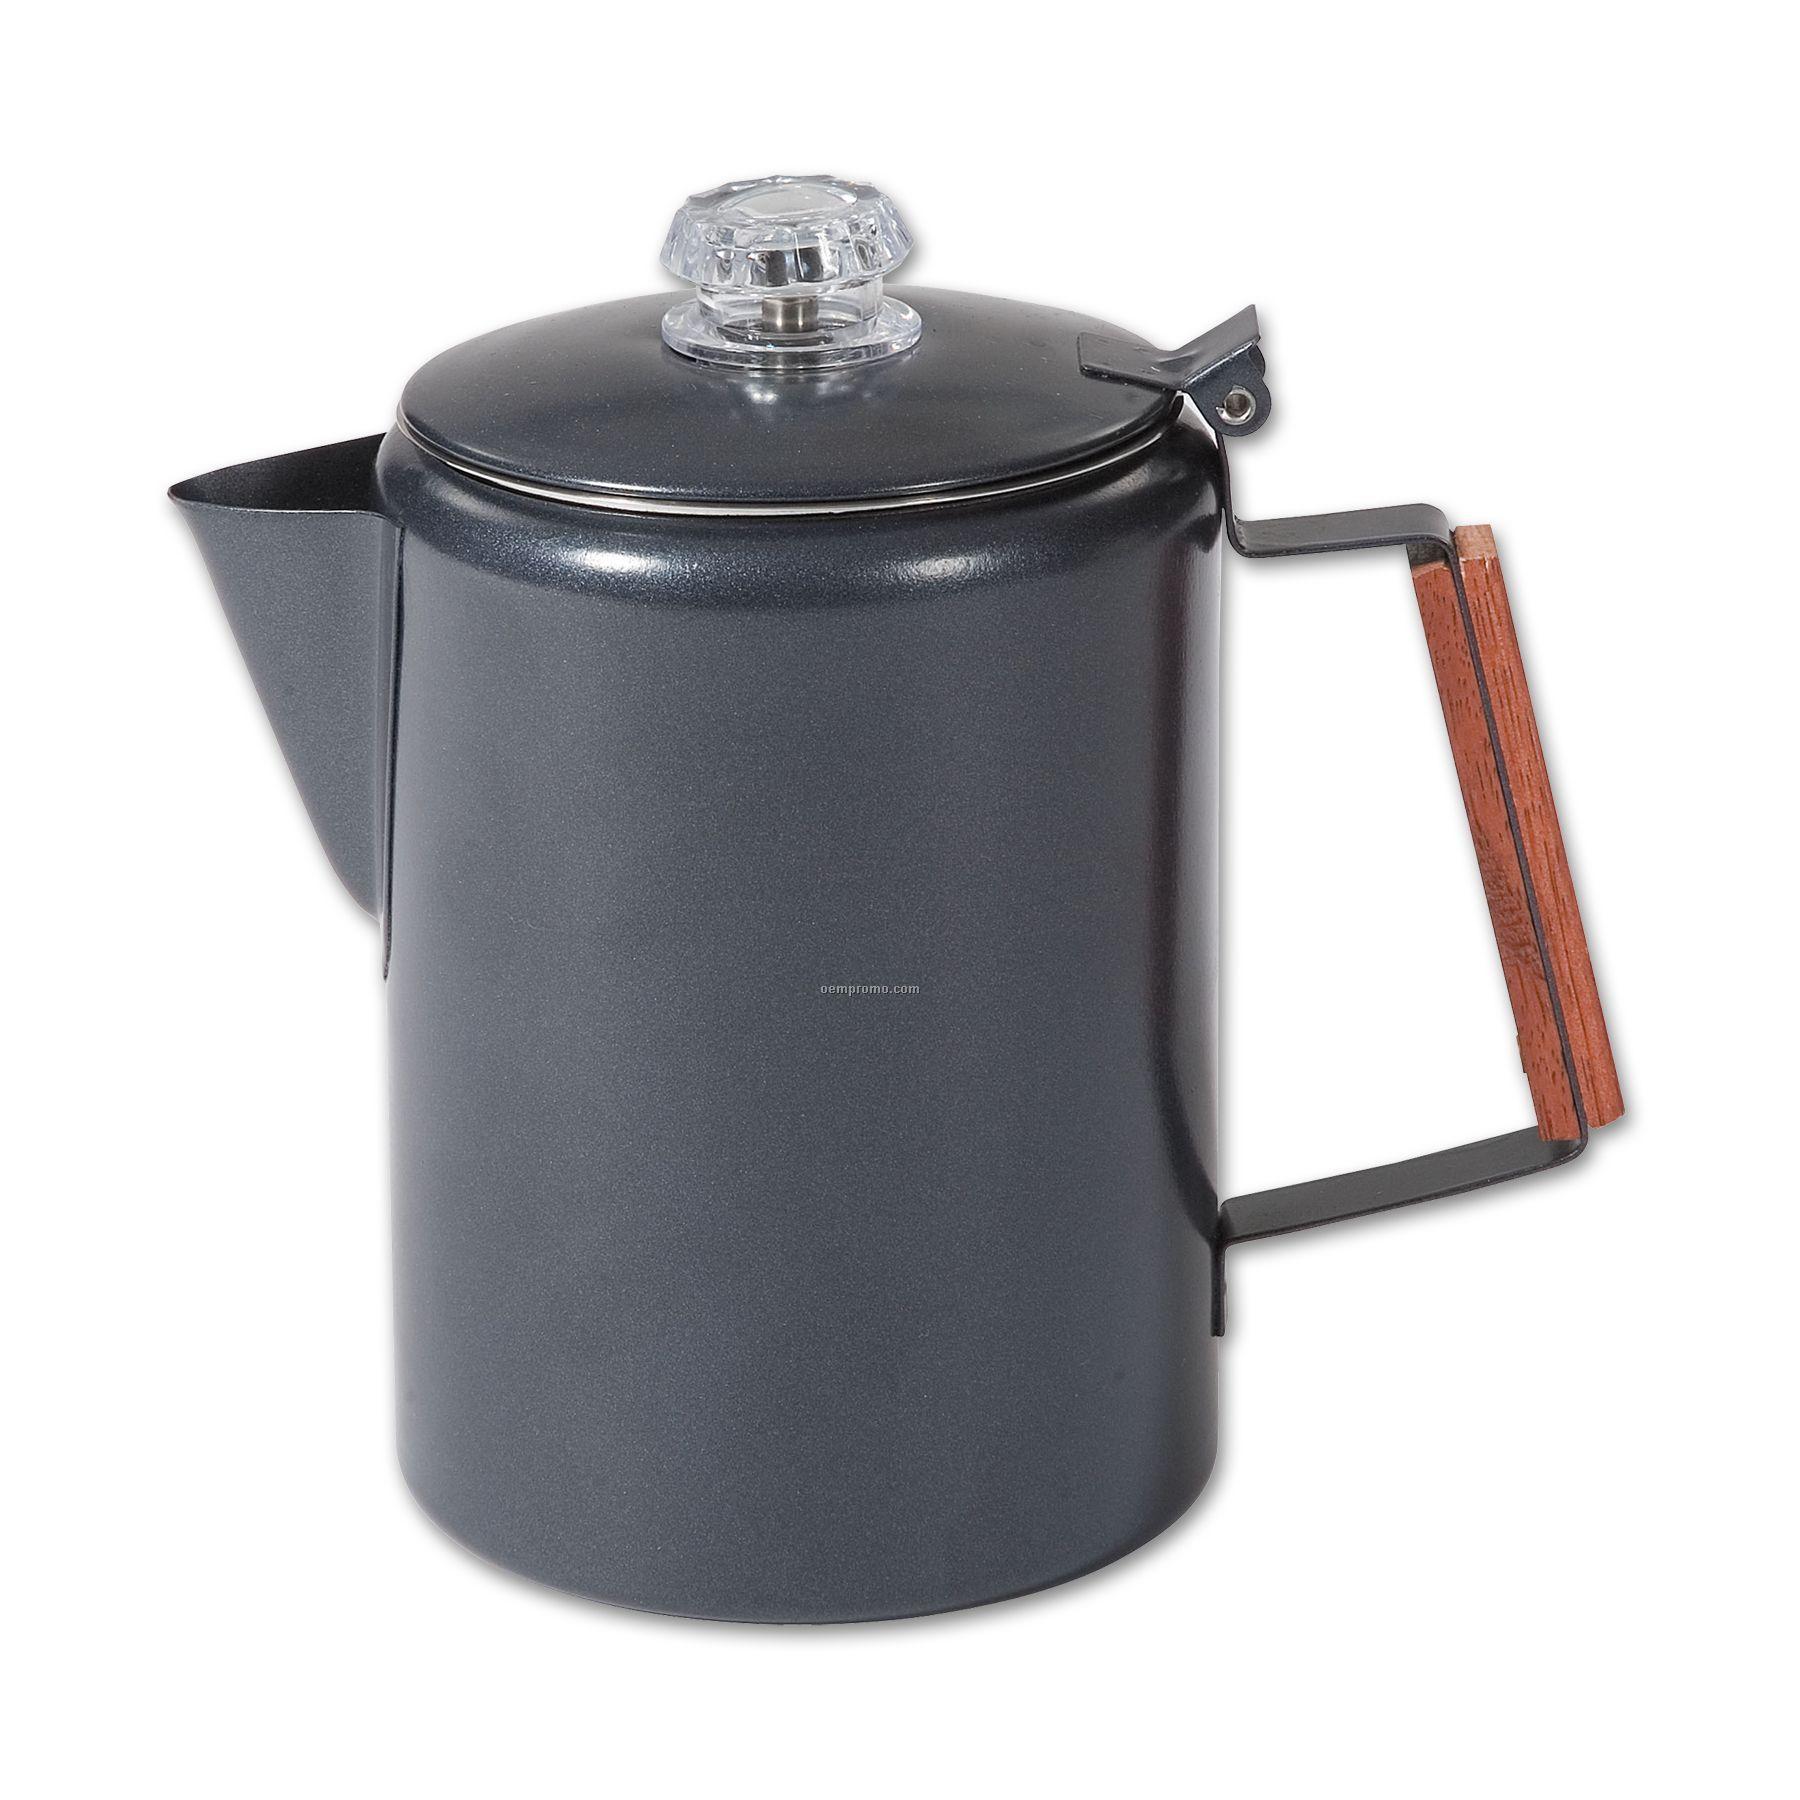 Stansport Percolator Coffee Pot - 9 Cup